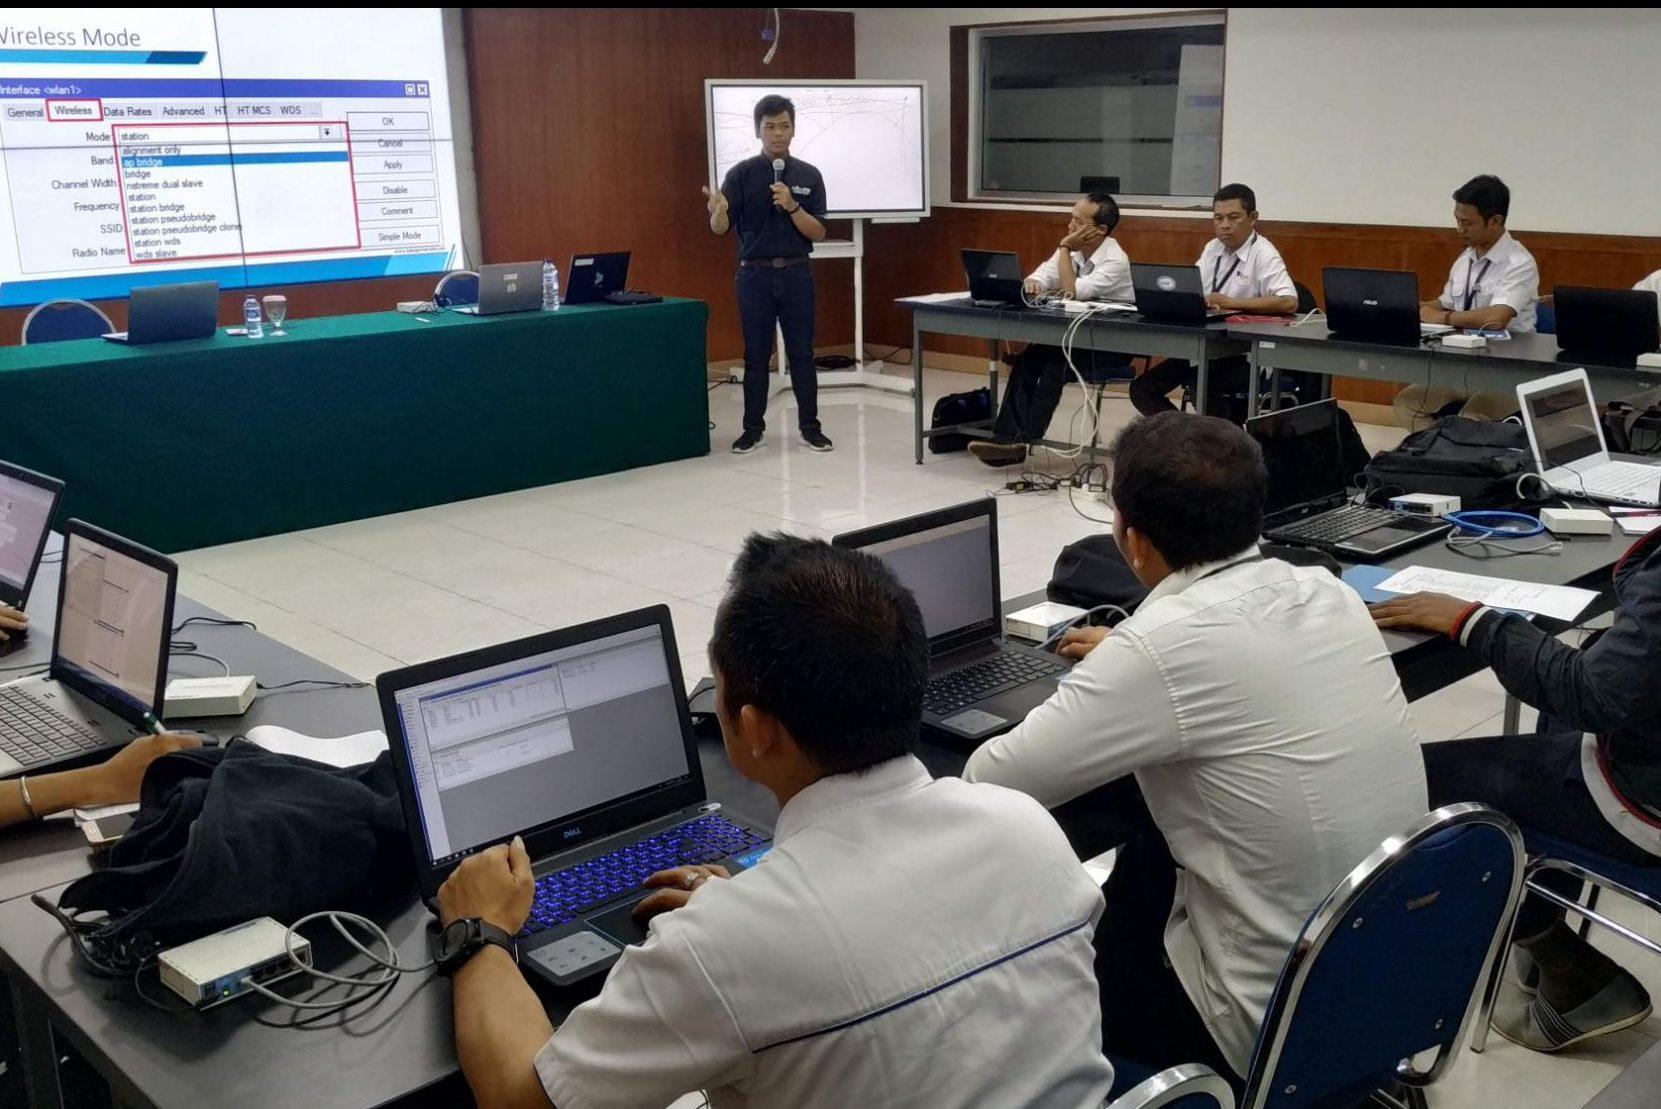 belajar, mikrotik, sertifikasi, training, IMG_20190313_104002